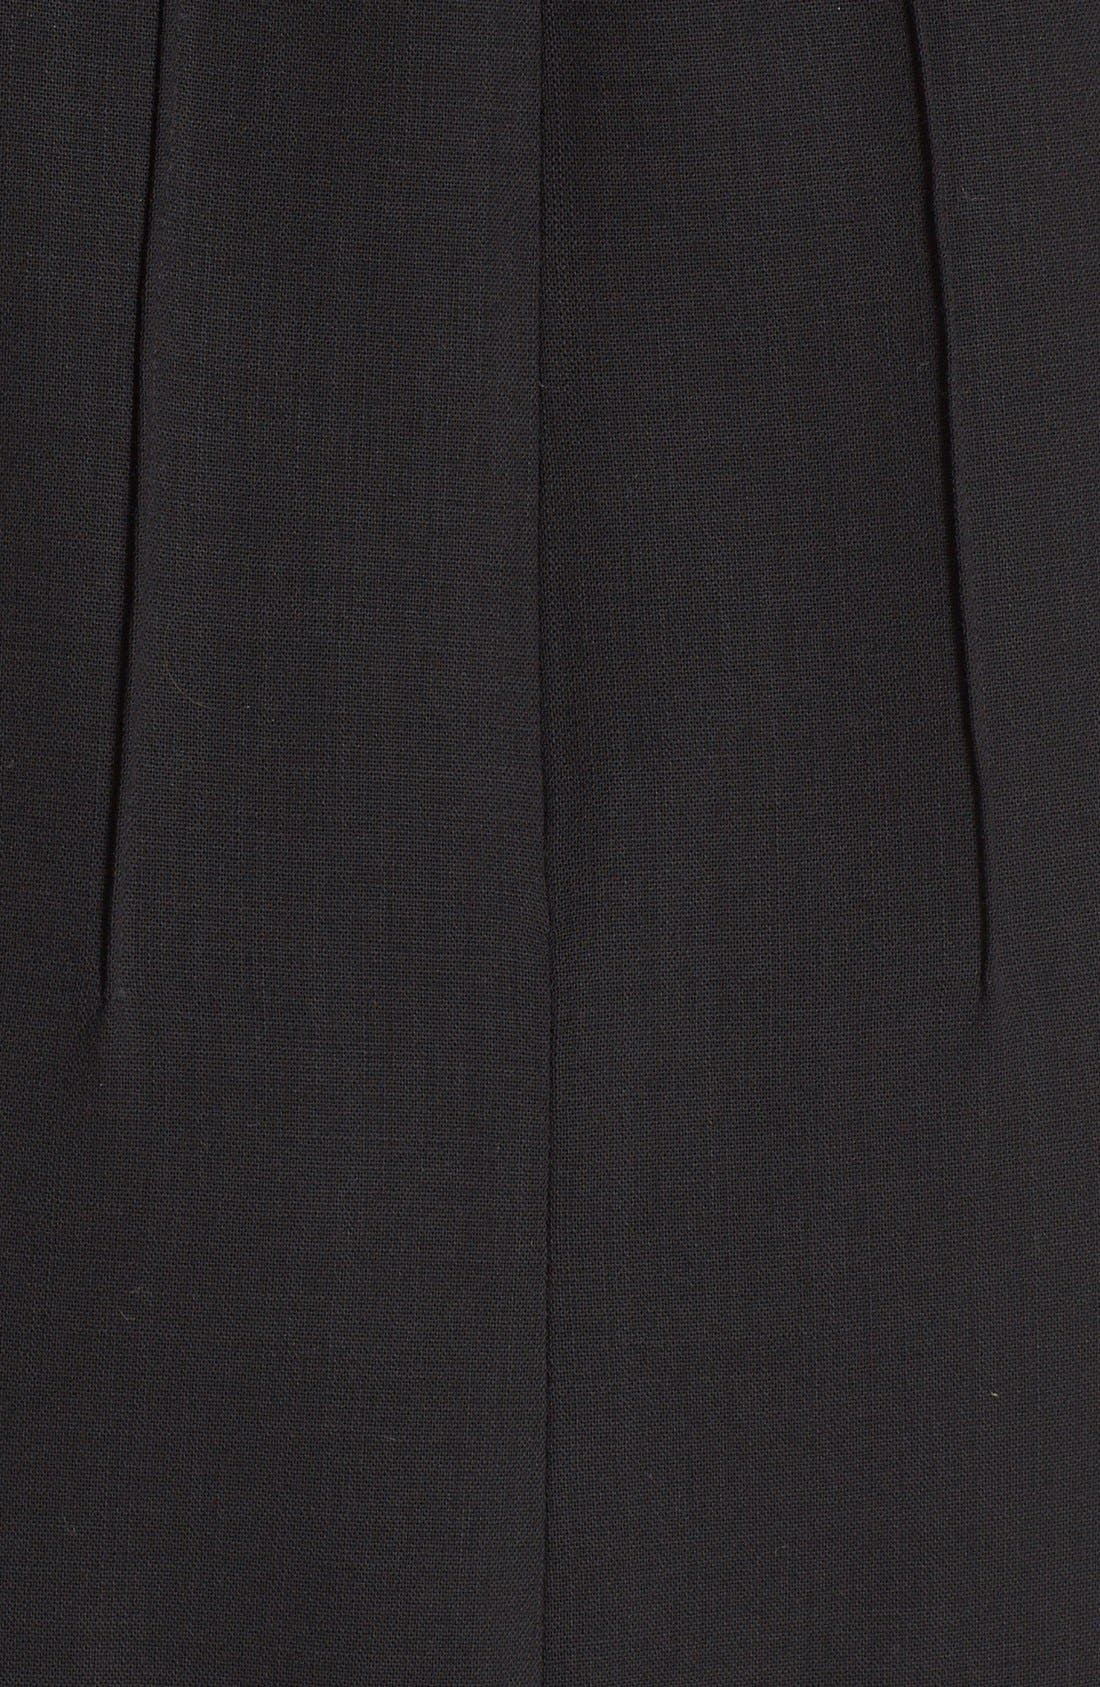 Alternate Image 3  - Lafayette 148 New York Debra Luxe Italian Double Face Dress